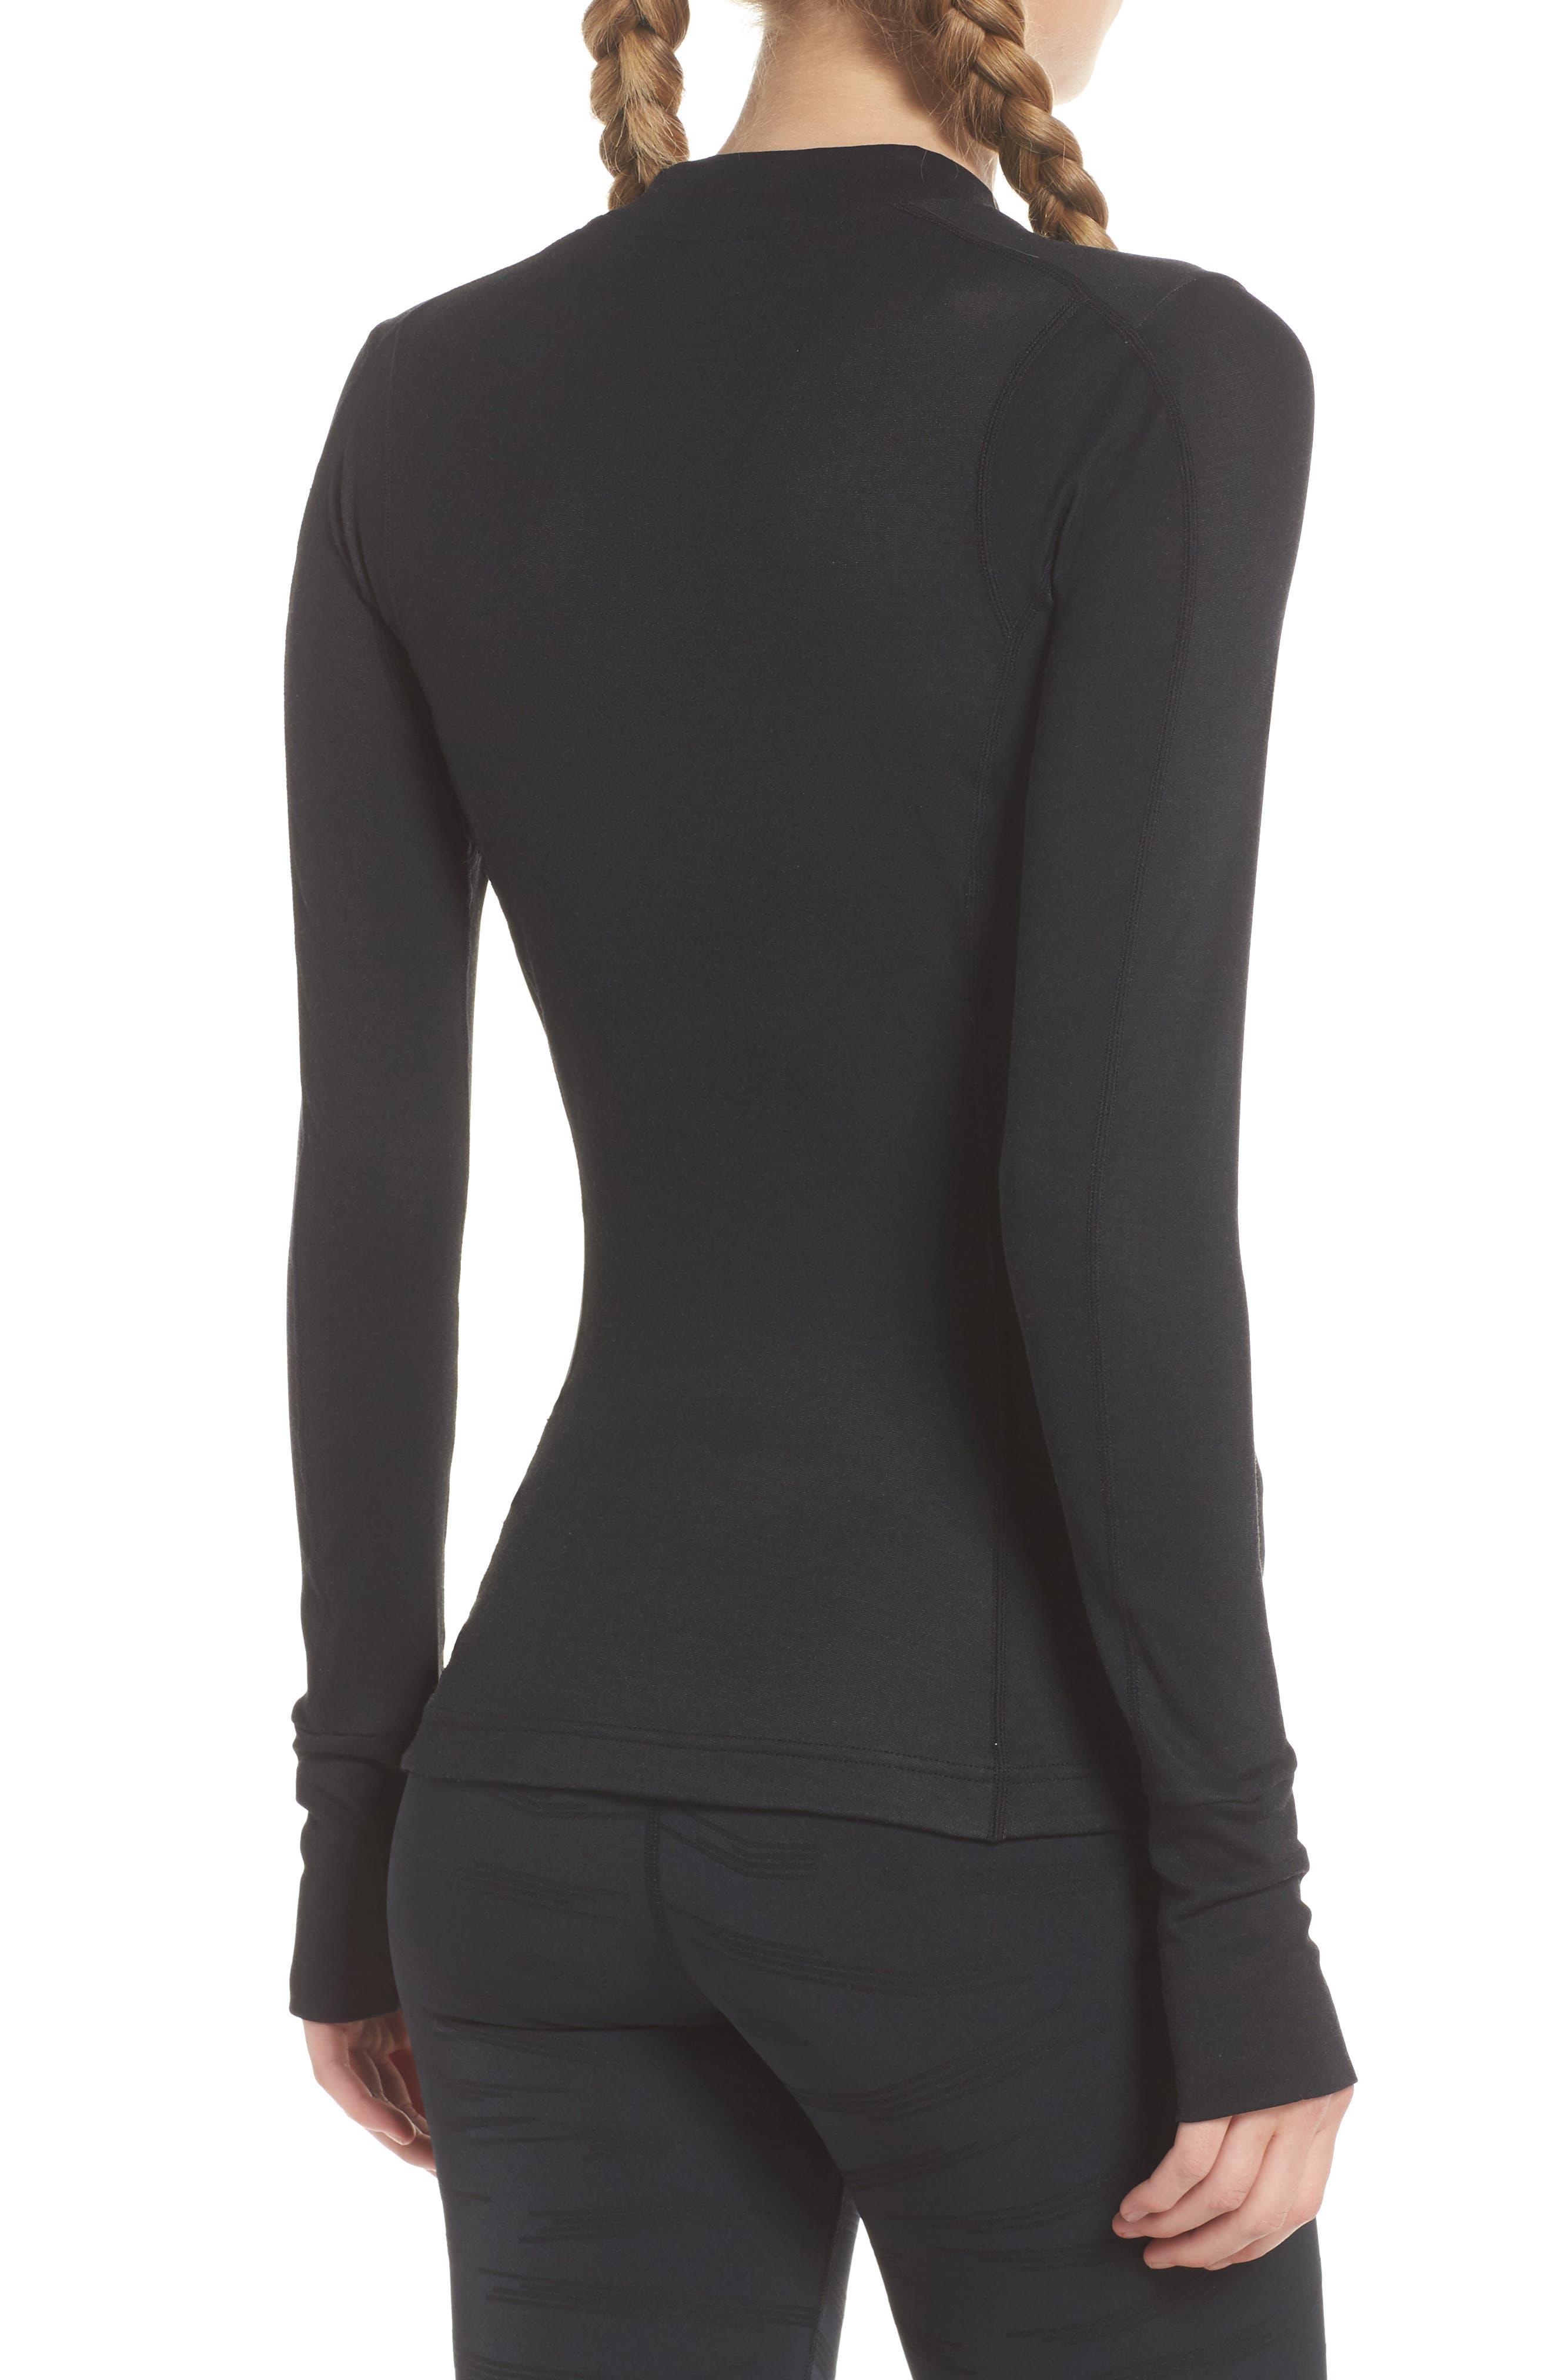 NikeLab ACG Long Sleeve Women's Top,                             Alternate thumbnail 2, color,                             010